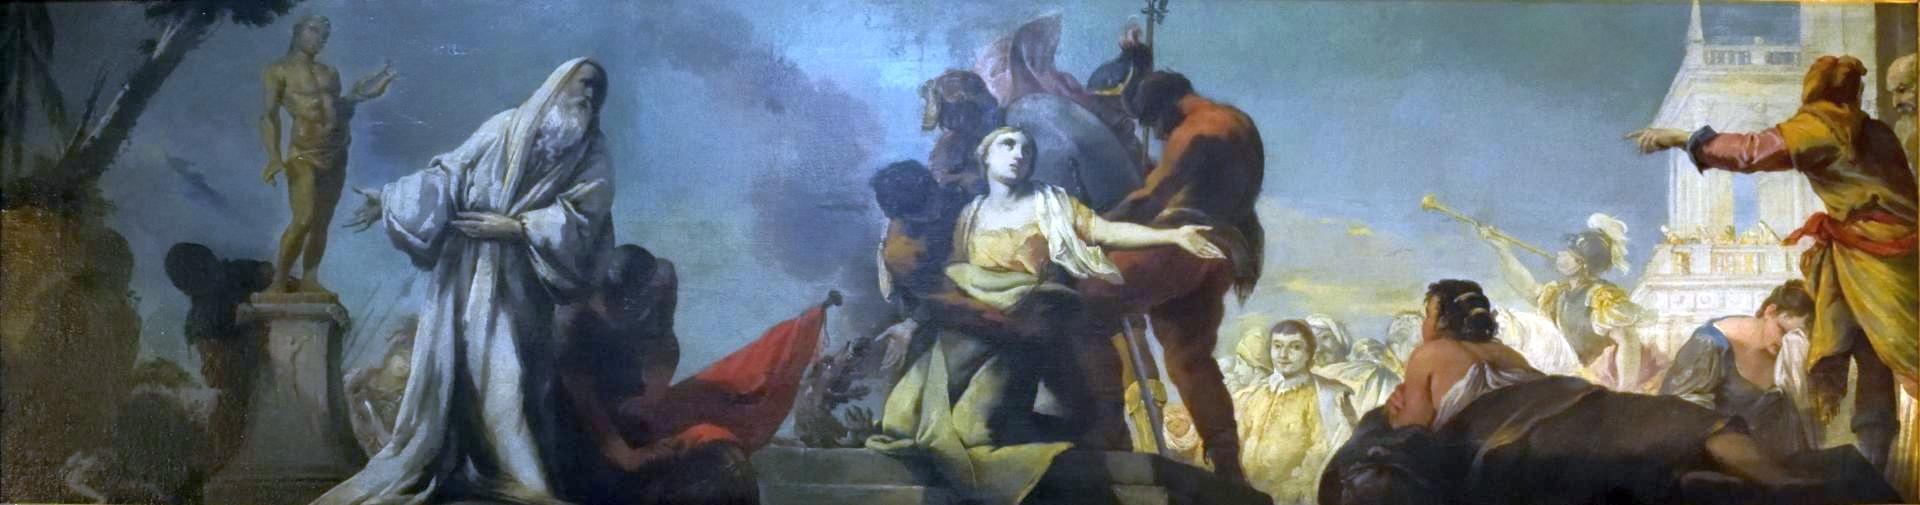 Oratorio di Santa Margherita - Padova - Presbiterio